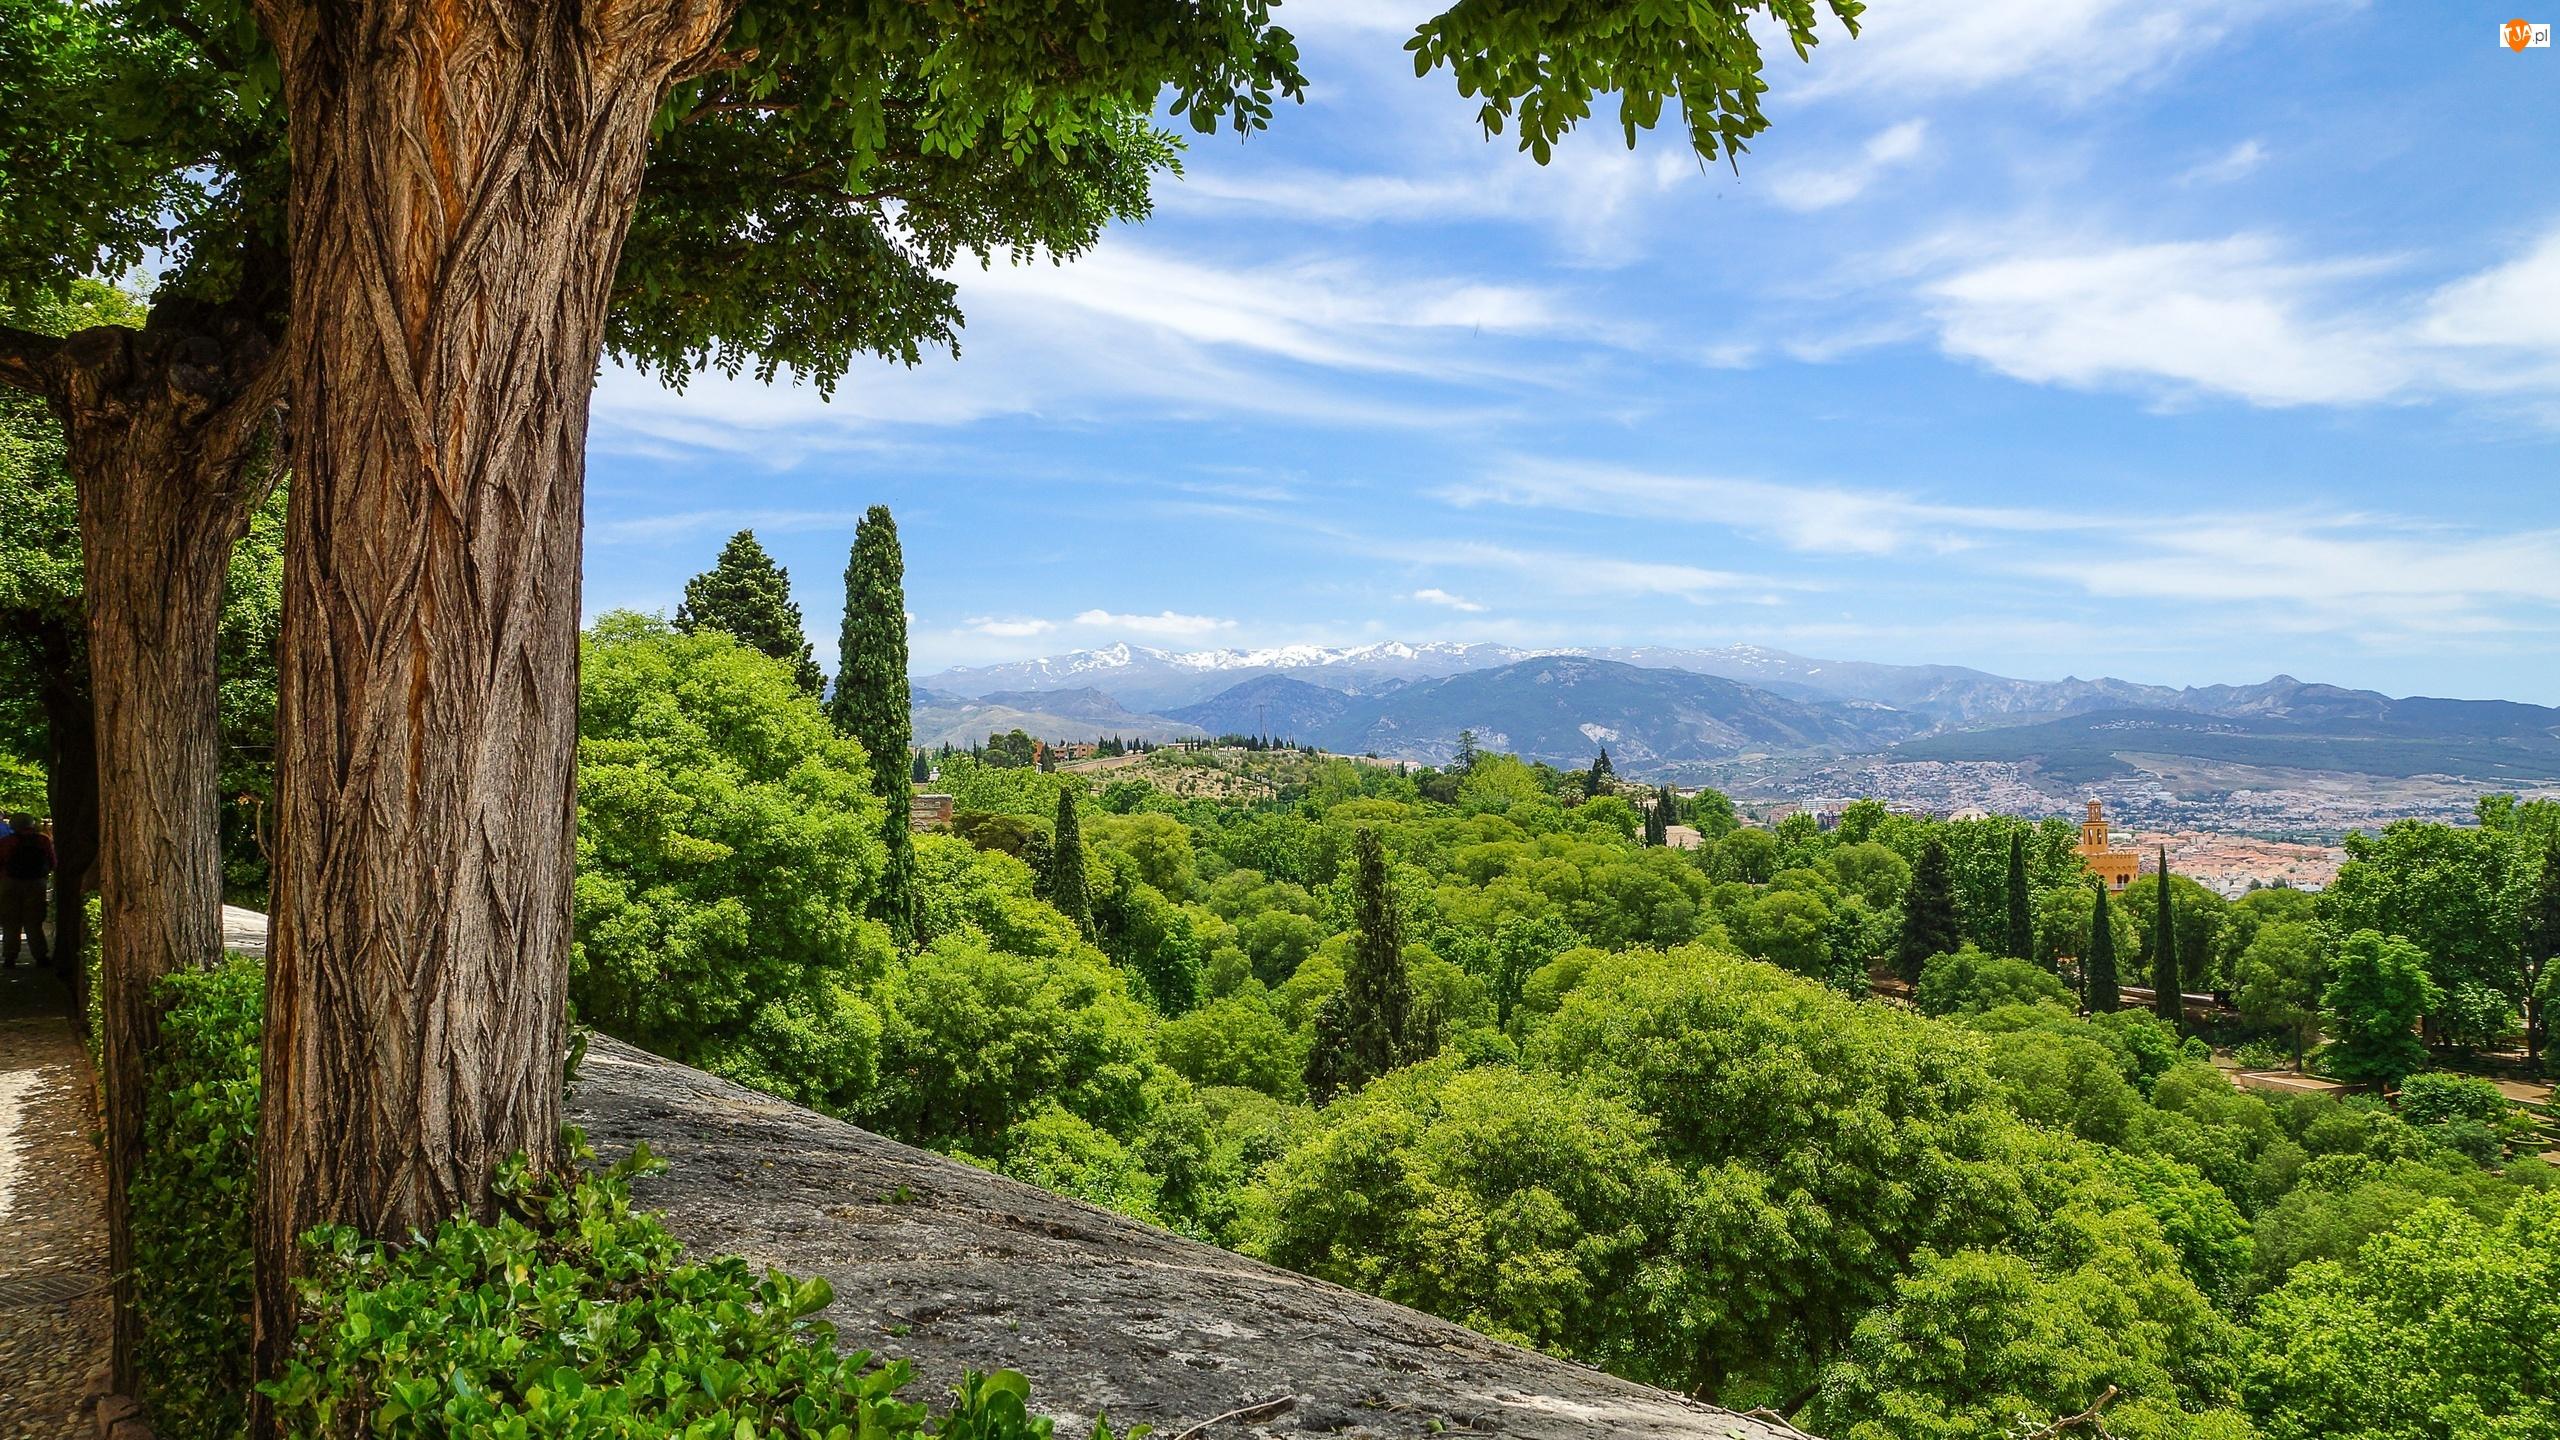 Murek, Drzewa, Grenada, Hiszpania, Góry, Andaluzja